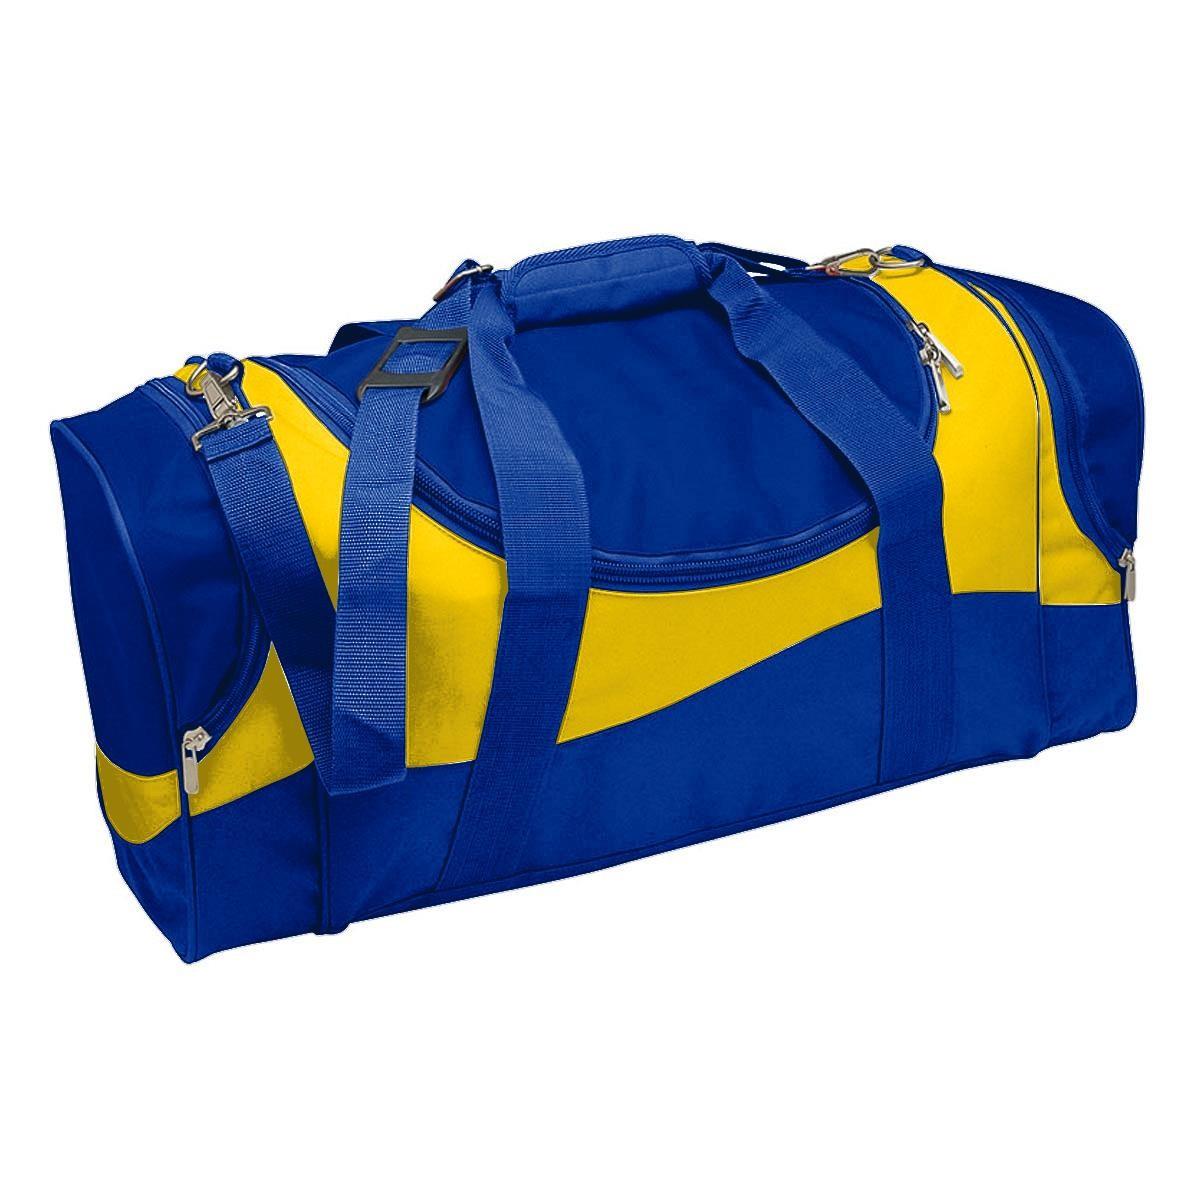 Sunset Sports Bag - Royal & Yellow